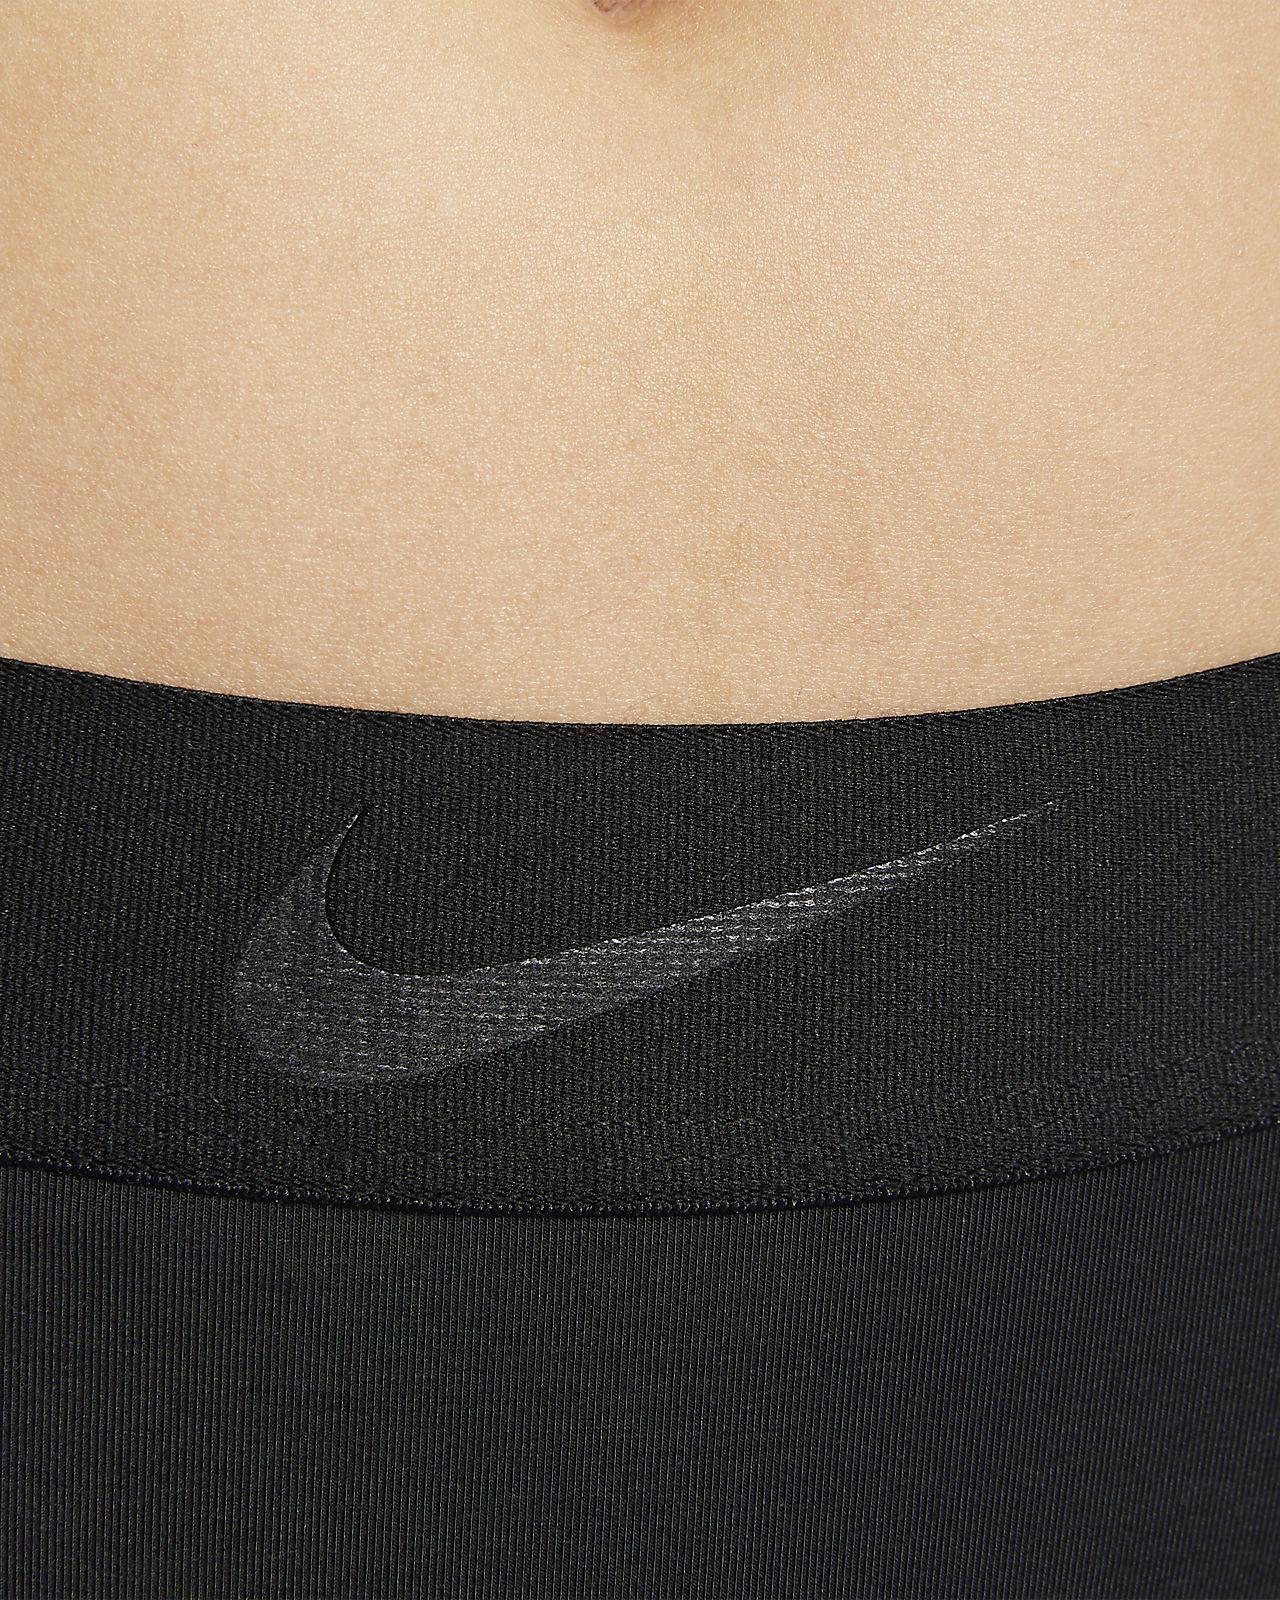 9ba03138e5f7 Nike x MMW Women's Underwear. Nike.com PH